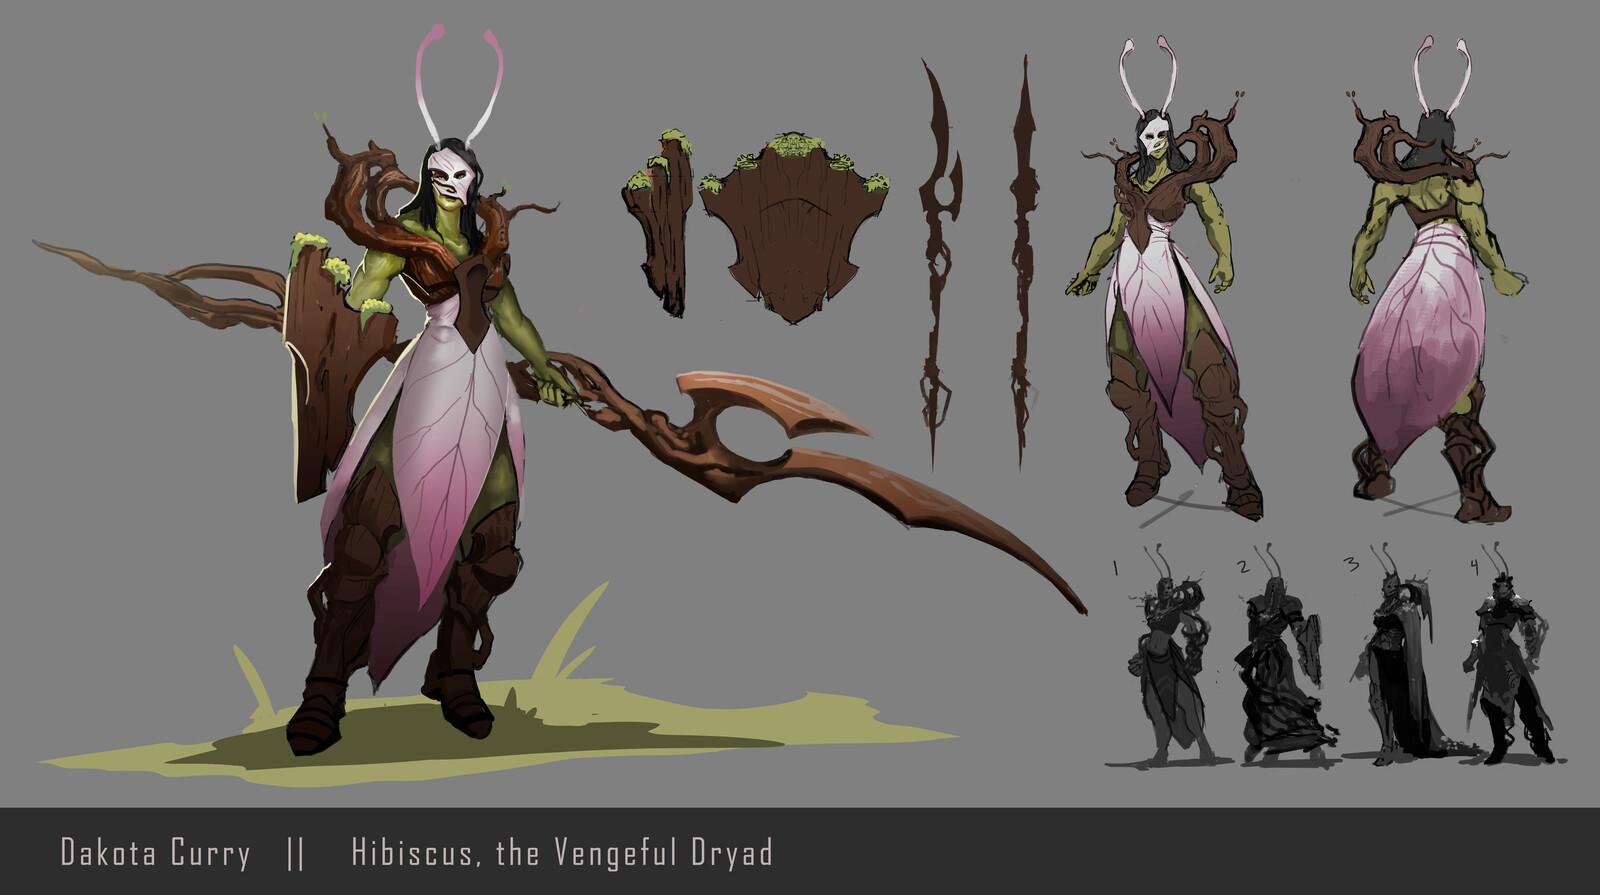 Hibiscus, the Vengeful Dryad